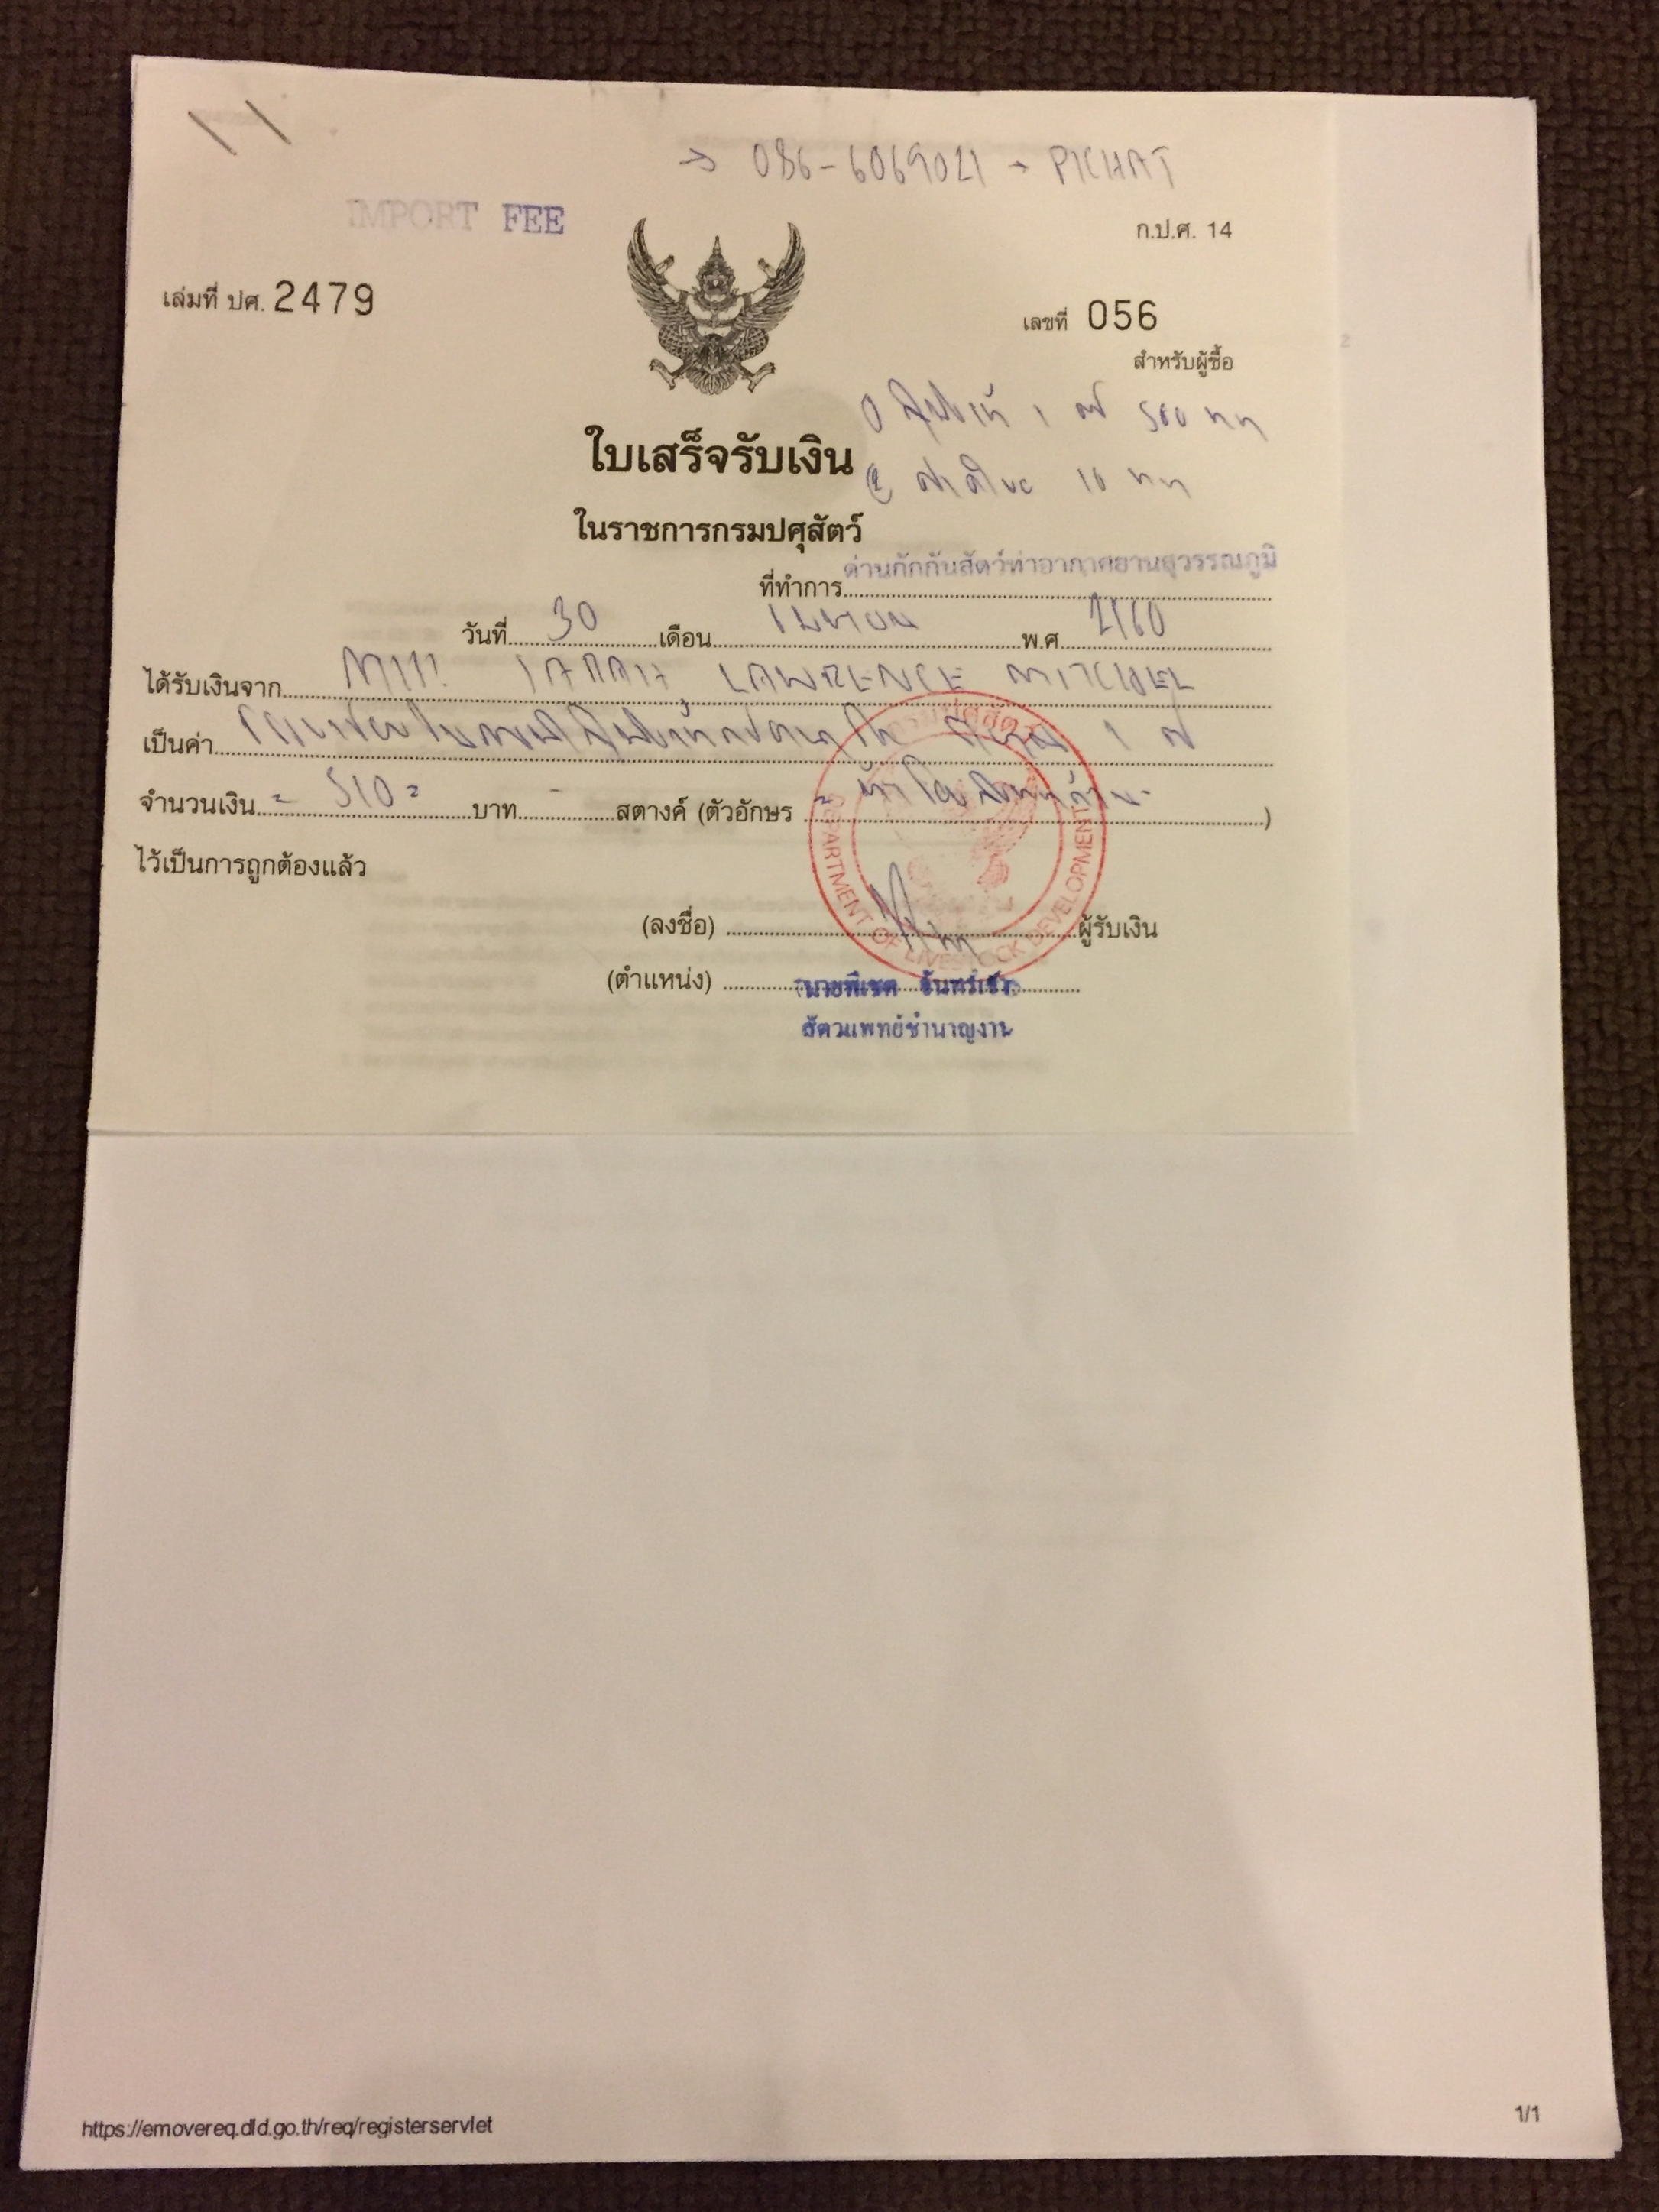 receipt for import permit